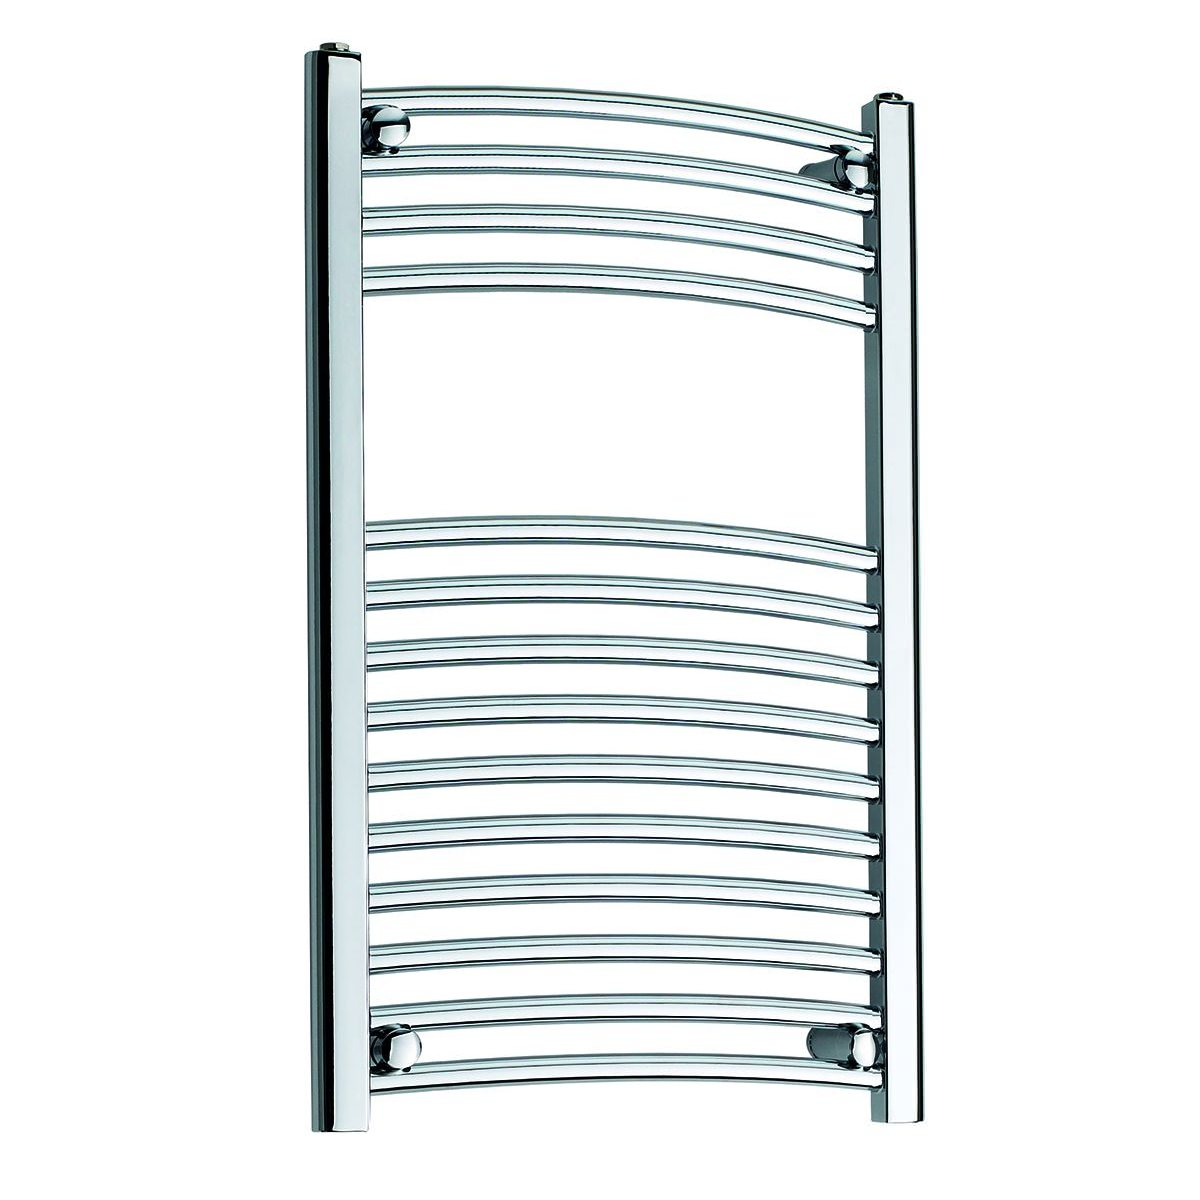 Bath Shower Thermostatic Mixer Taps Kartell K Rail 22mm Curved Towel Rail 600 X 800mm White